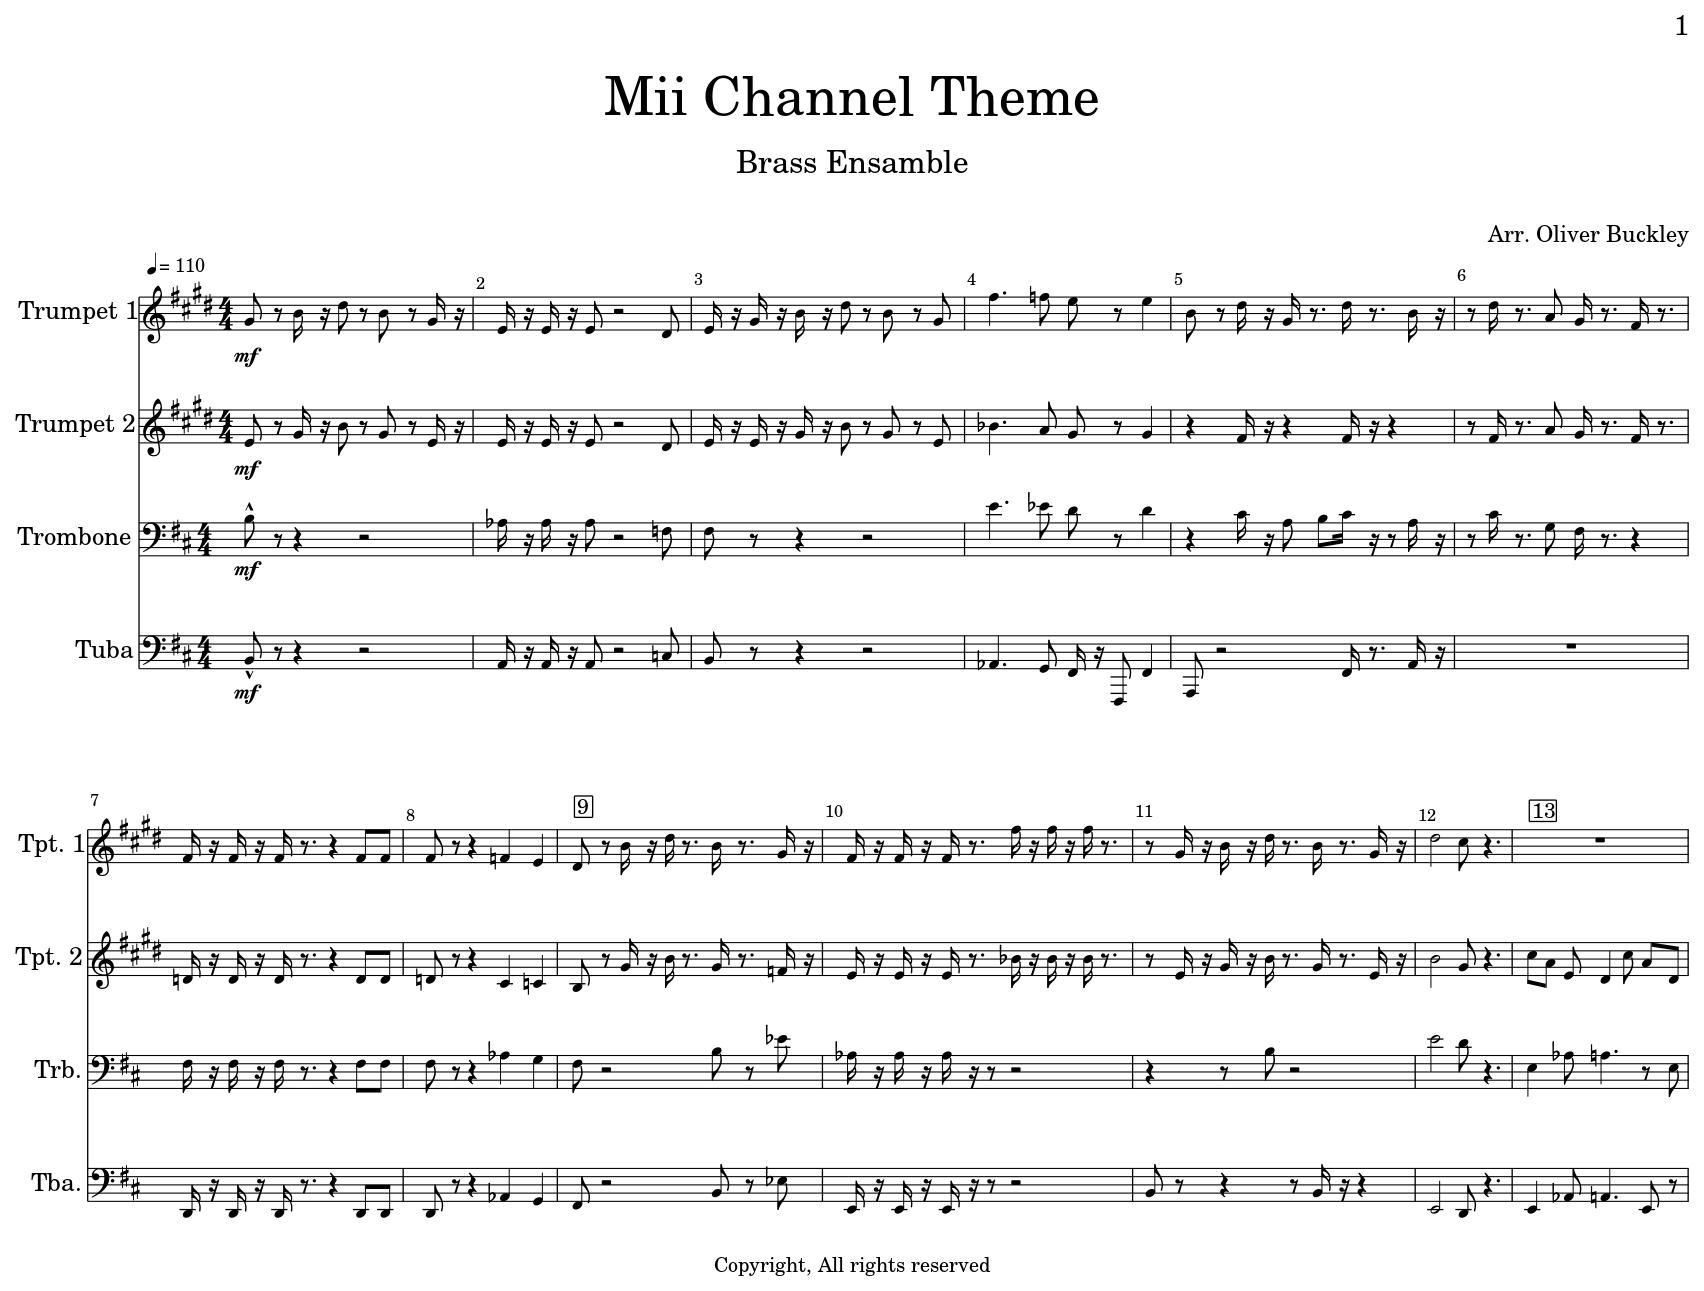 Mii Channel Theme - Sheet music for Trumpet, Trombone, Tuba